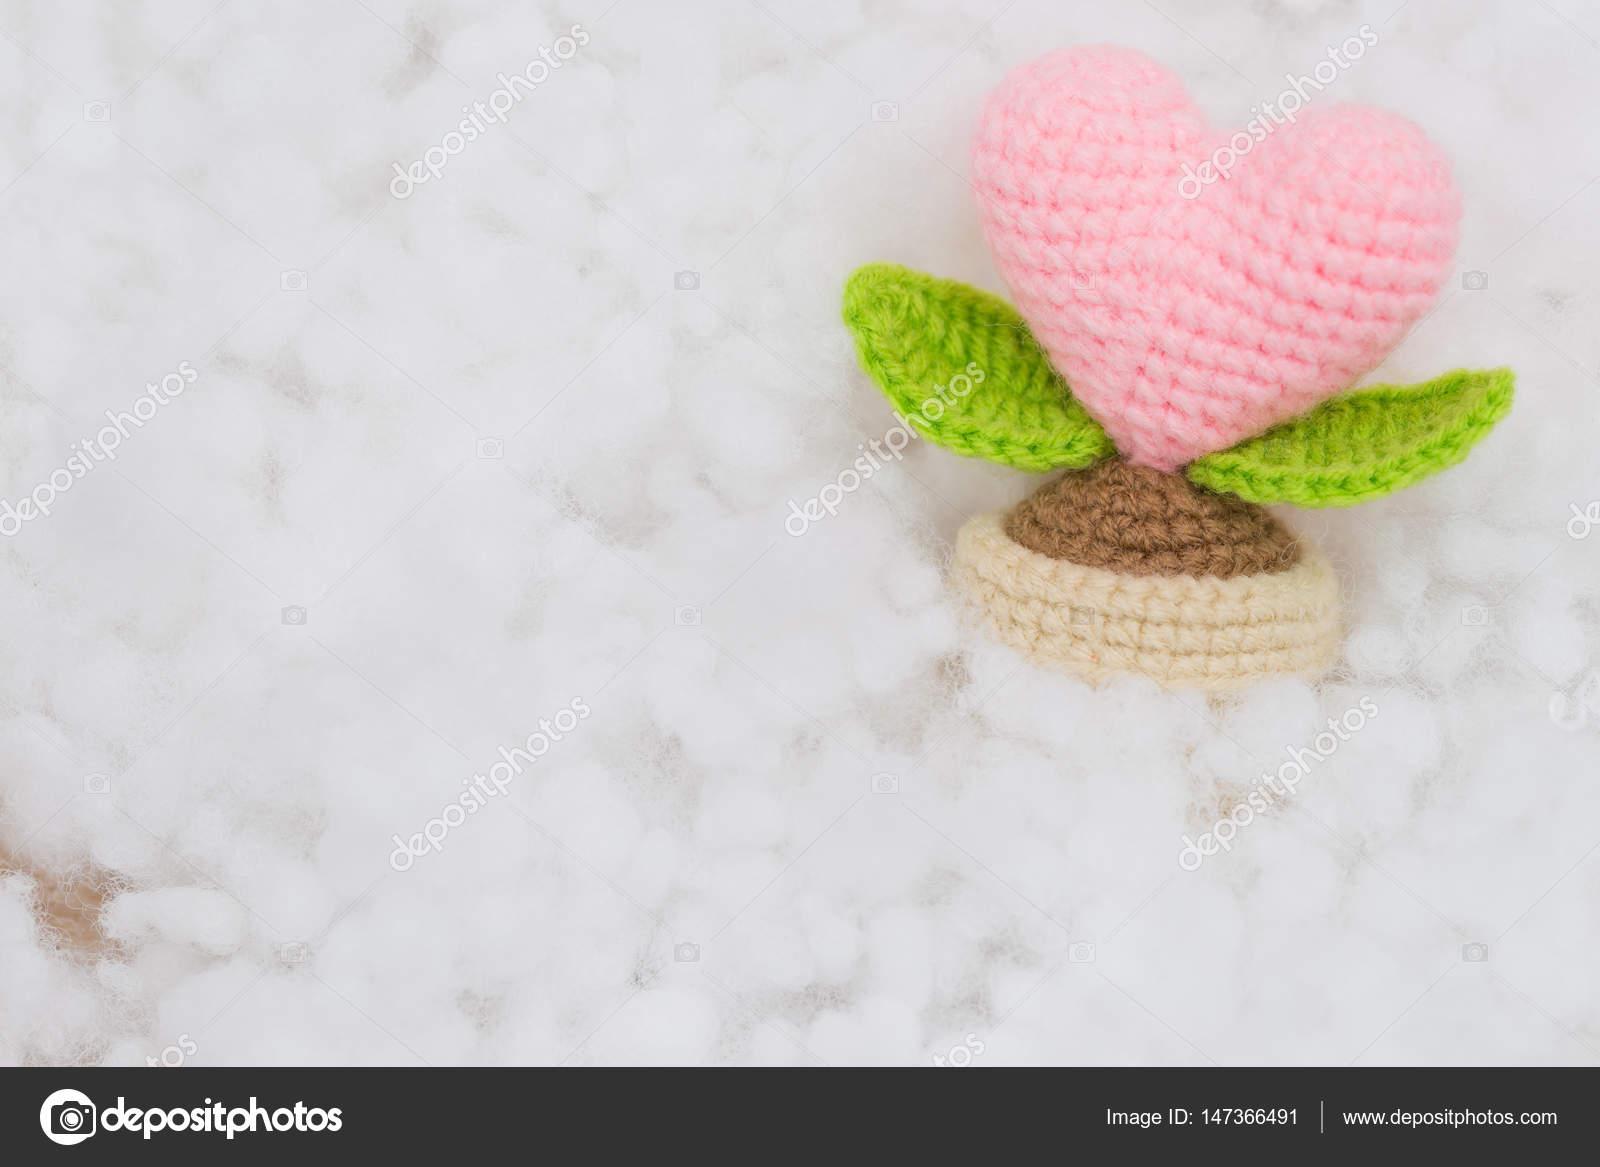 Rosa Herz Baum häkeln mit polyester — Stockfoto © Champja #147366491